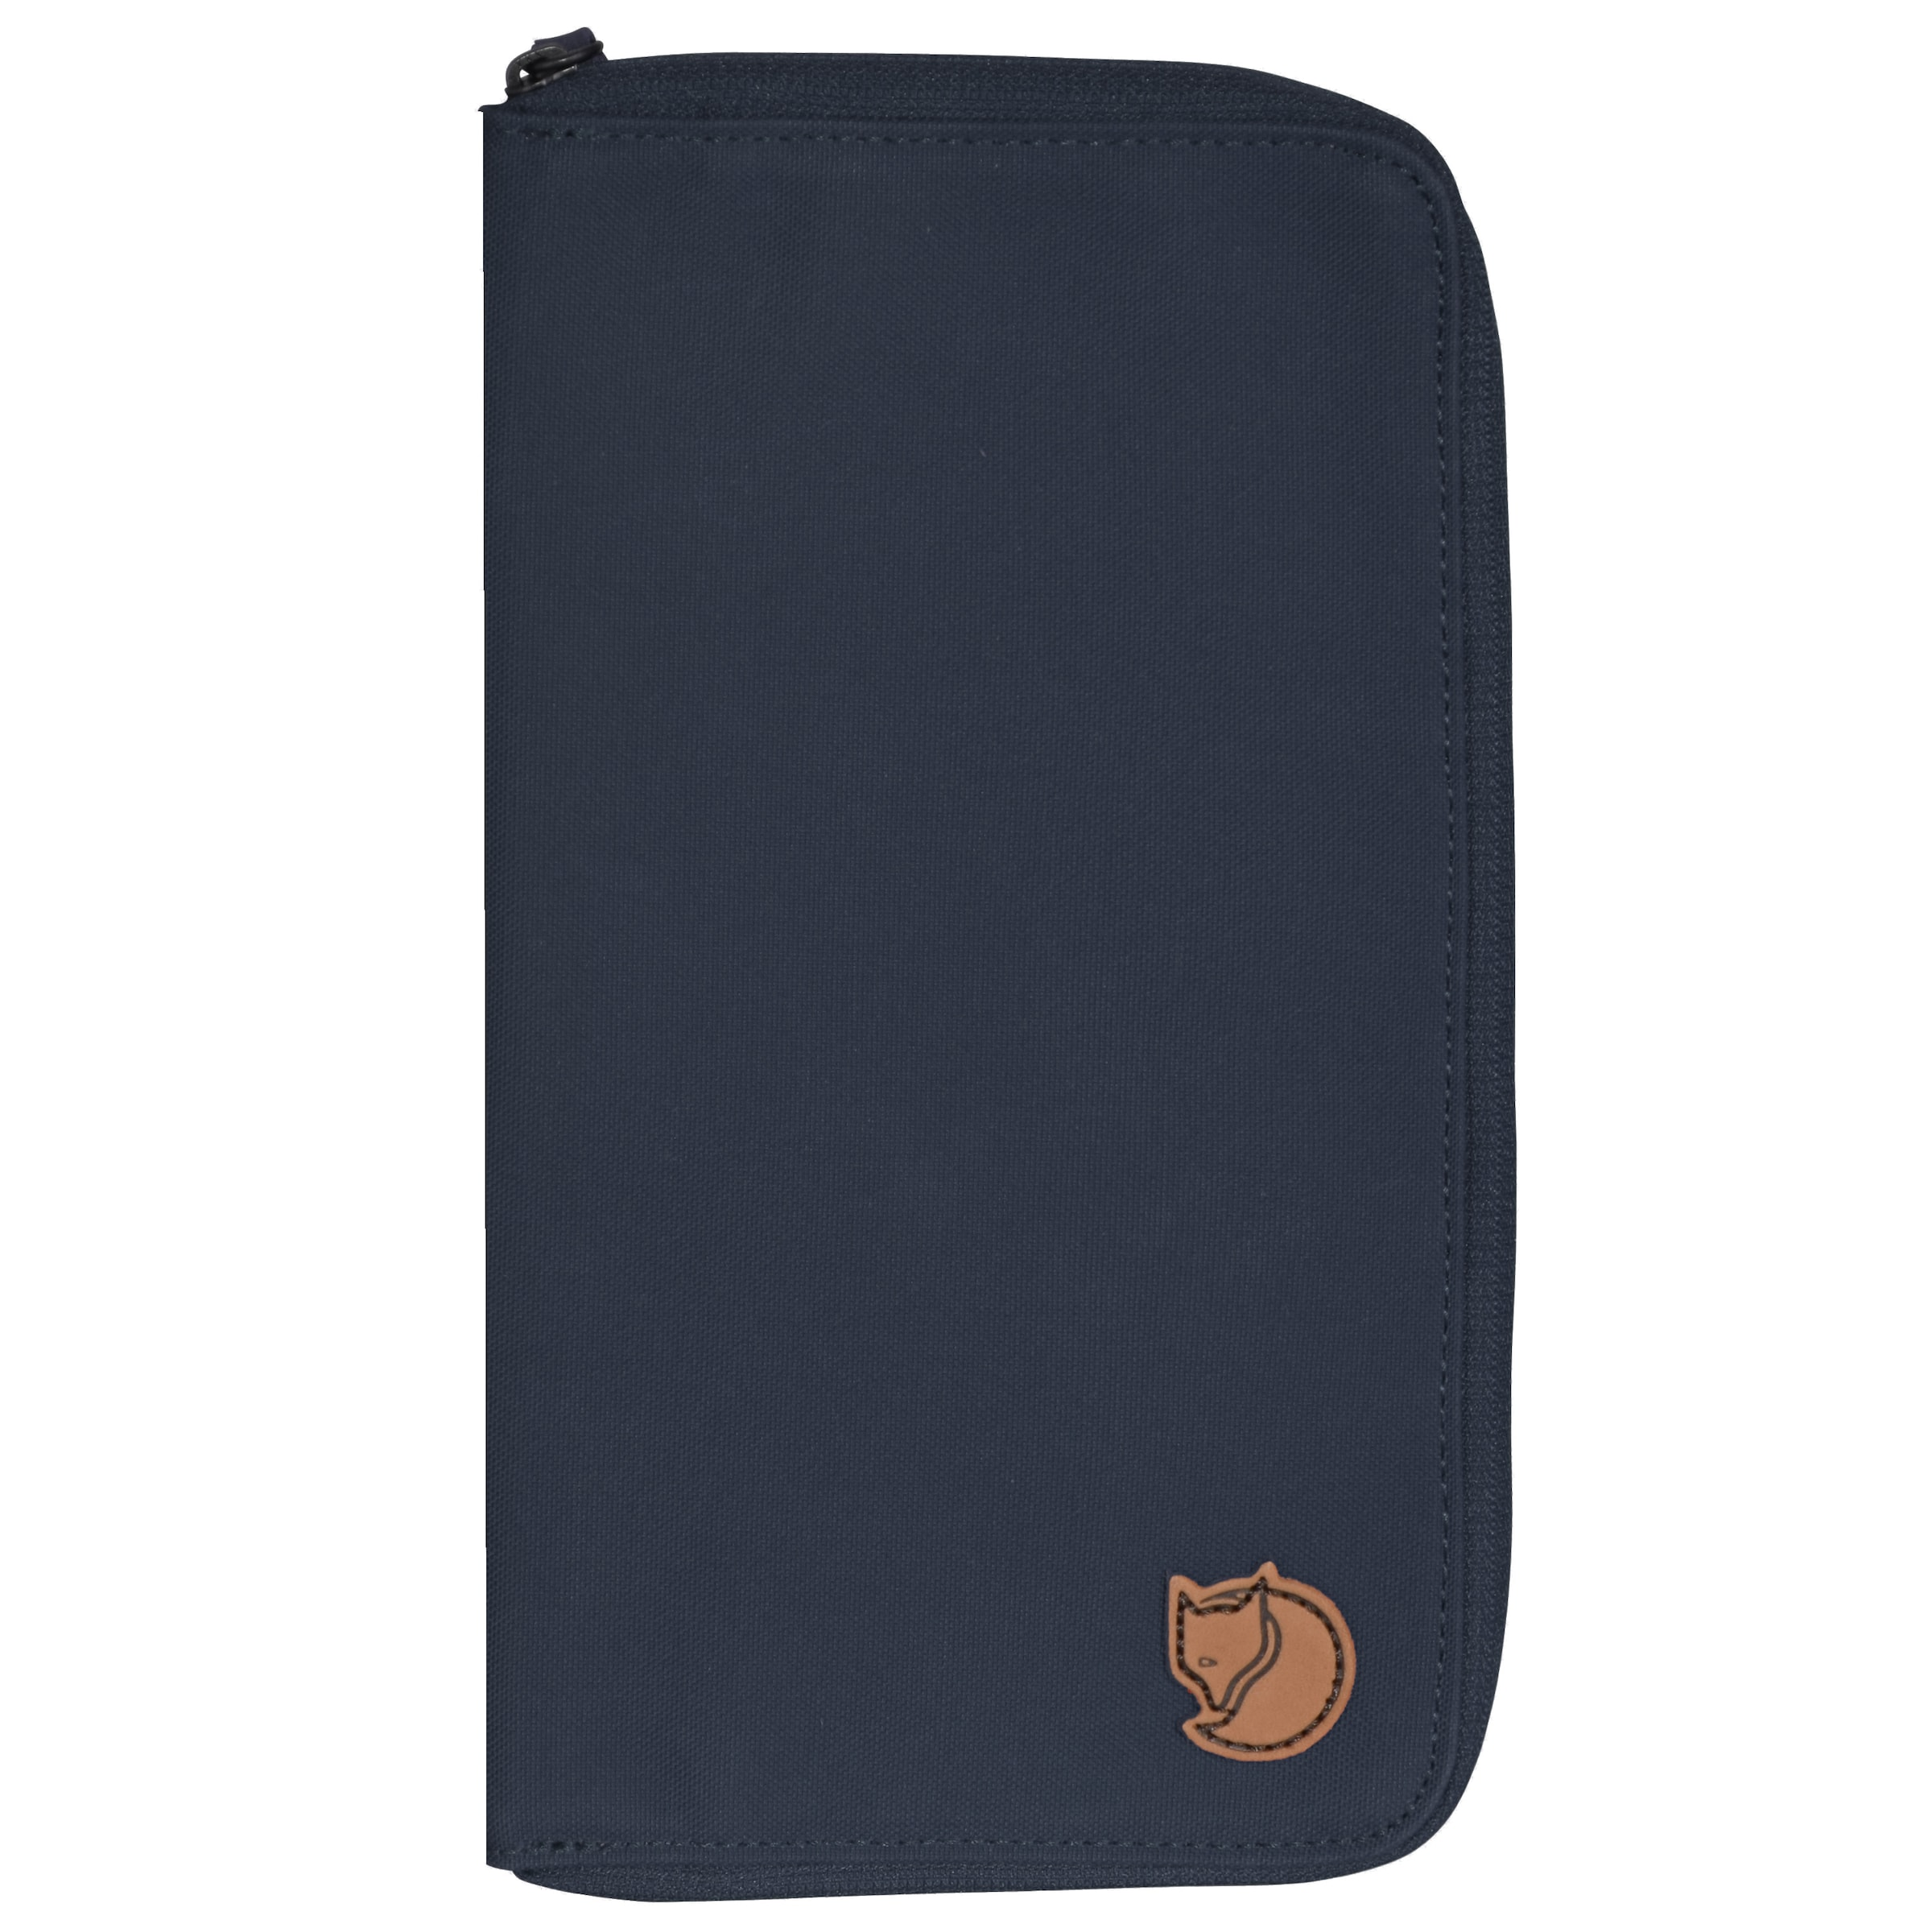 Fjällräven Reisebrieftasche 12 cm Billig Klassisch Footlocker Zum Verkauf Ebay Auslass Offiziell Ebay Online le0relR